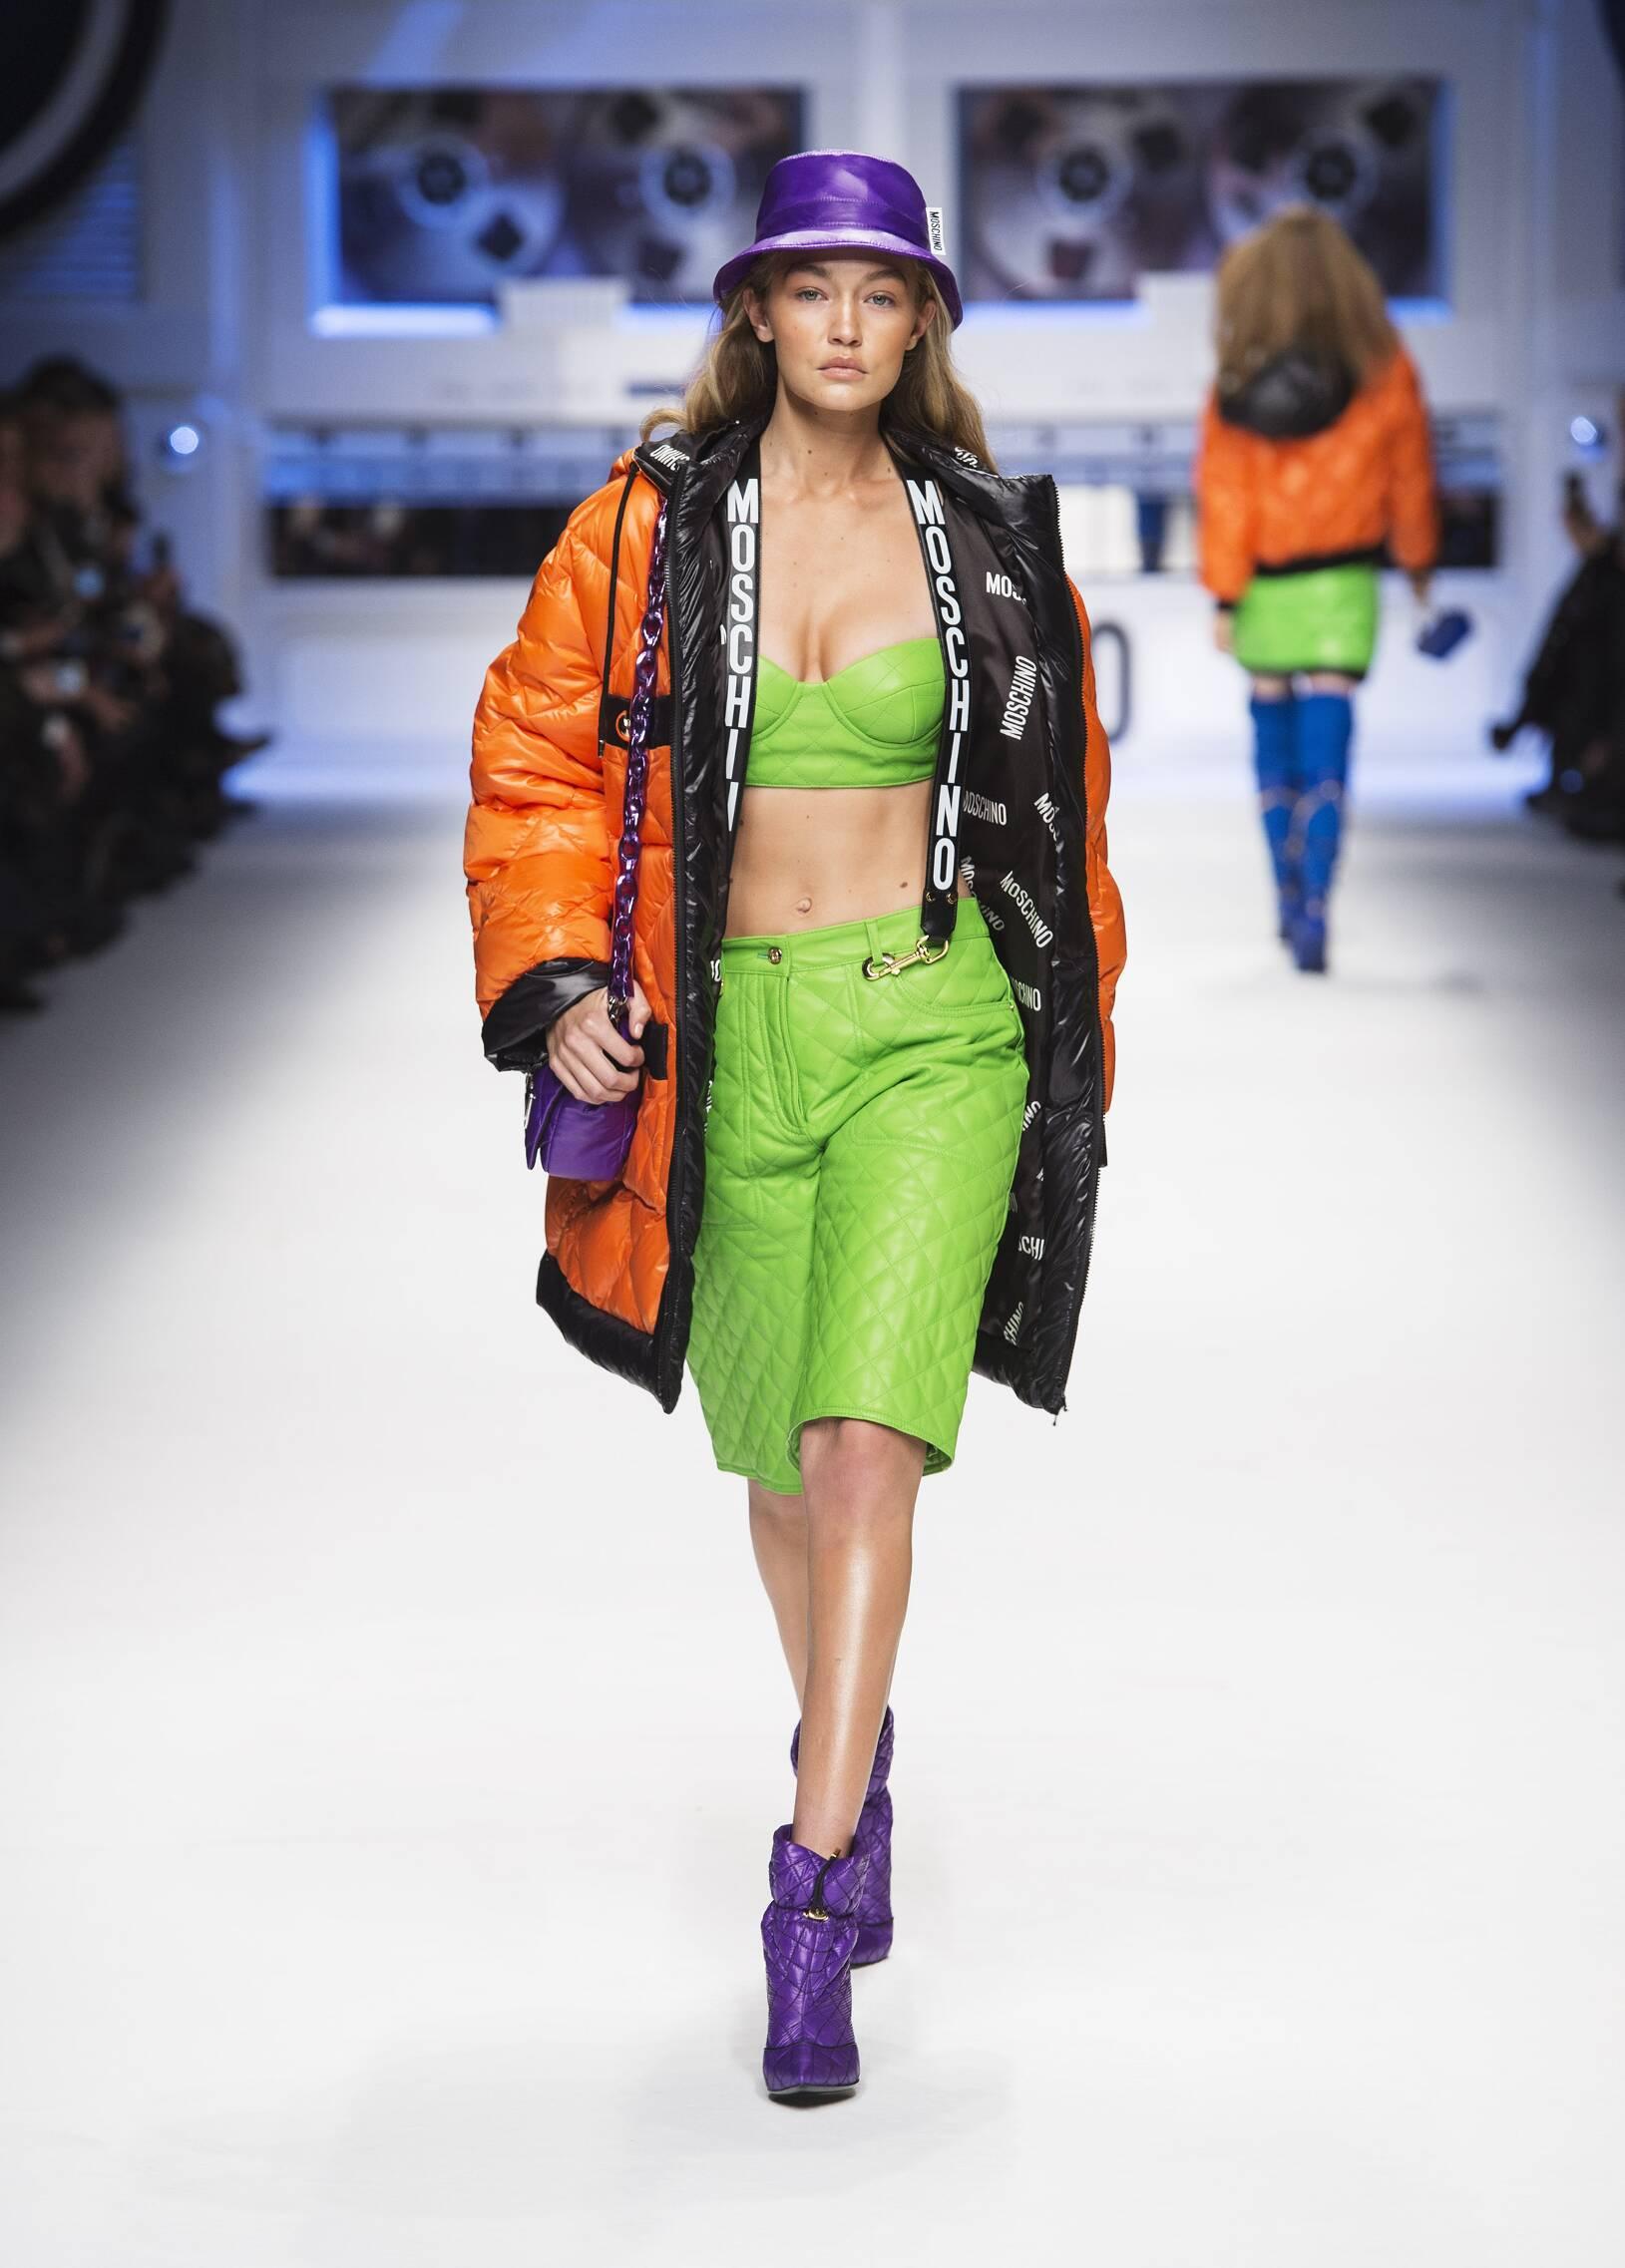 Fall Winter 2015 16 Fashion Collection Moschino